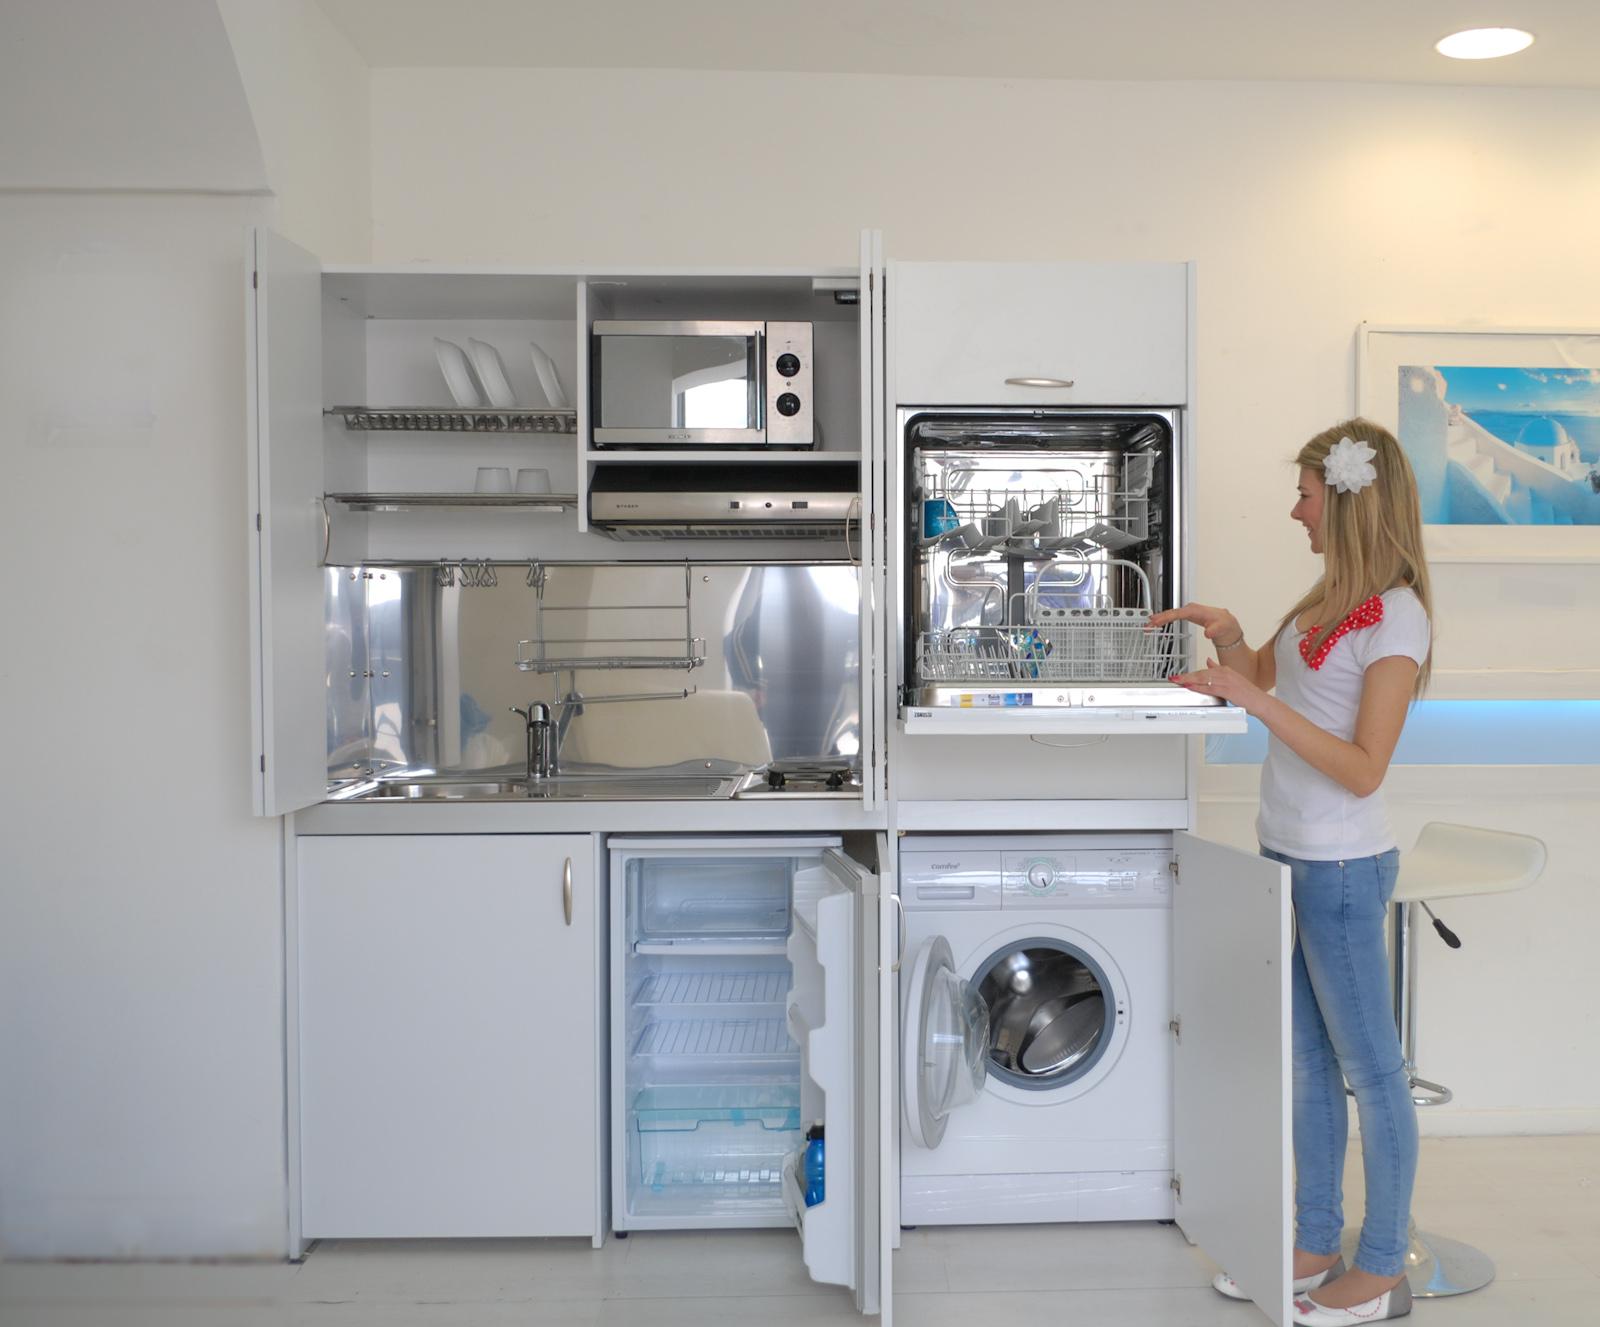 Monoblocco cucine salvaspazio compact con serranda for Salvaspazio cucina